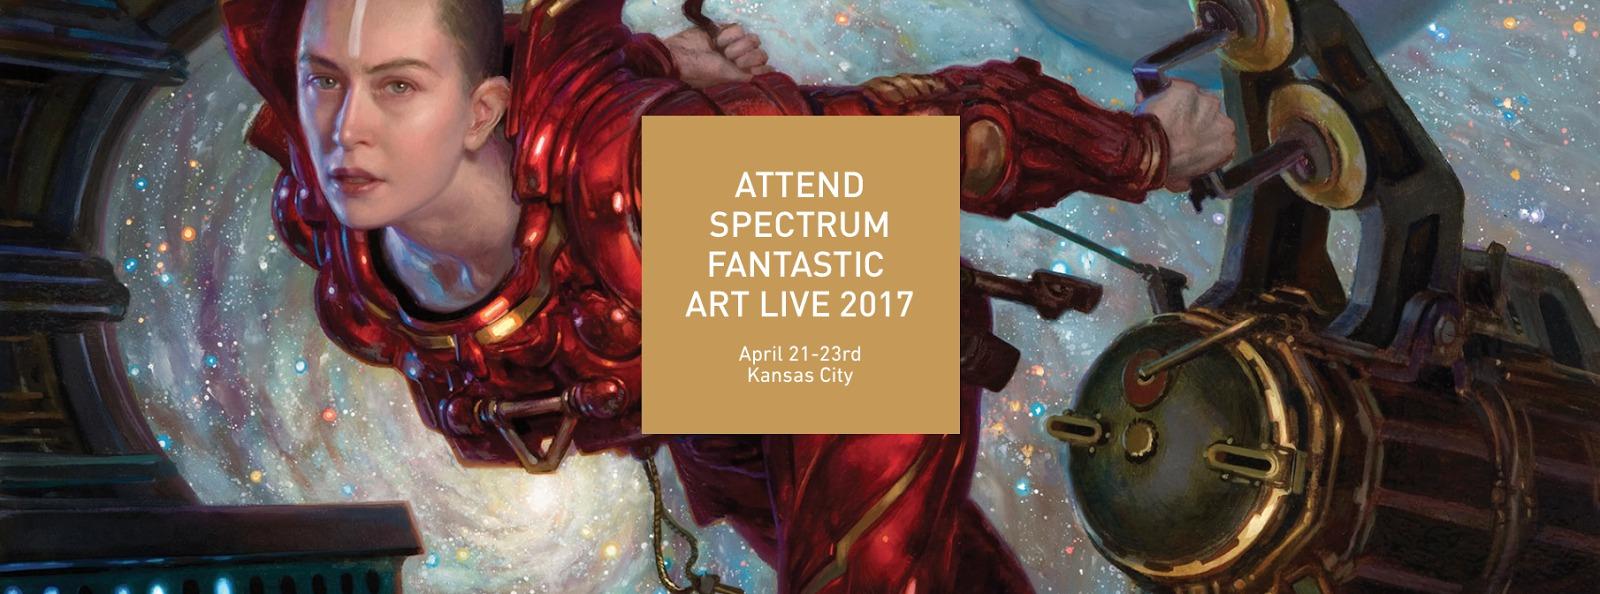 Spectrum Fantastic Art Live 2017: Goin' to Kansas City